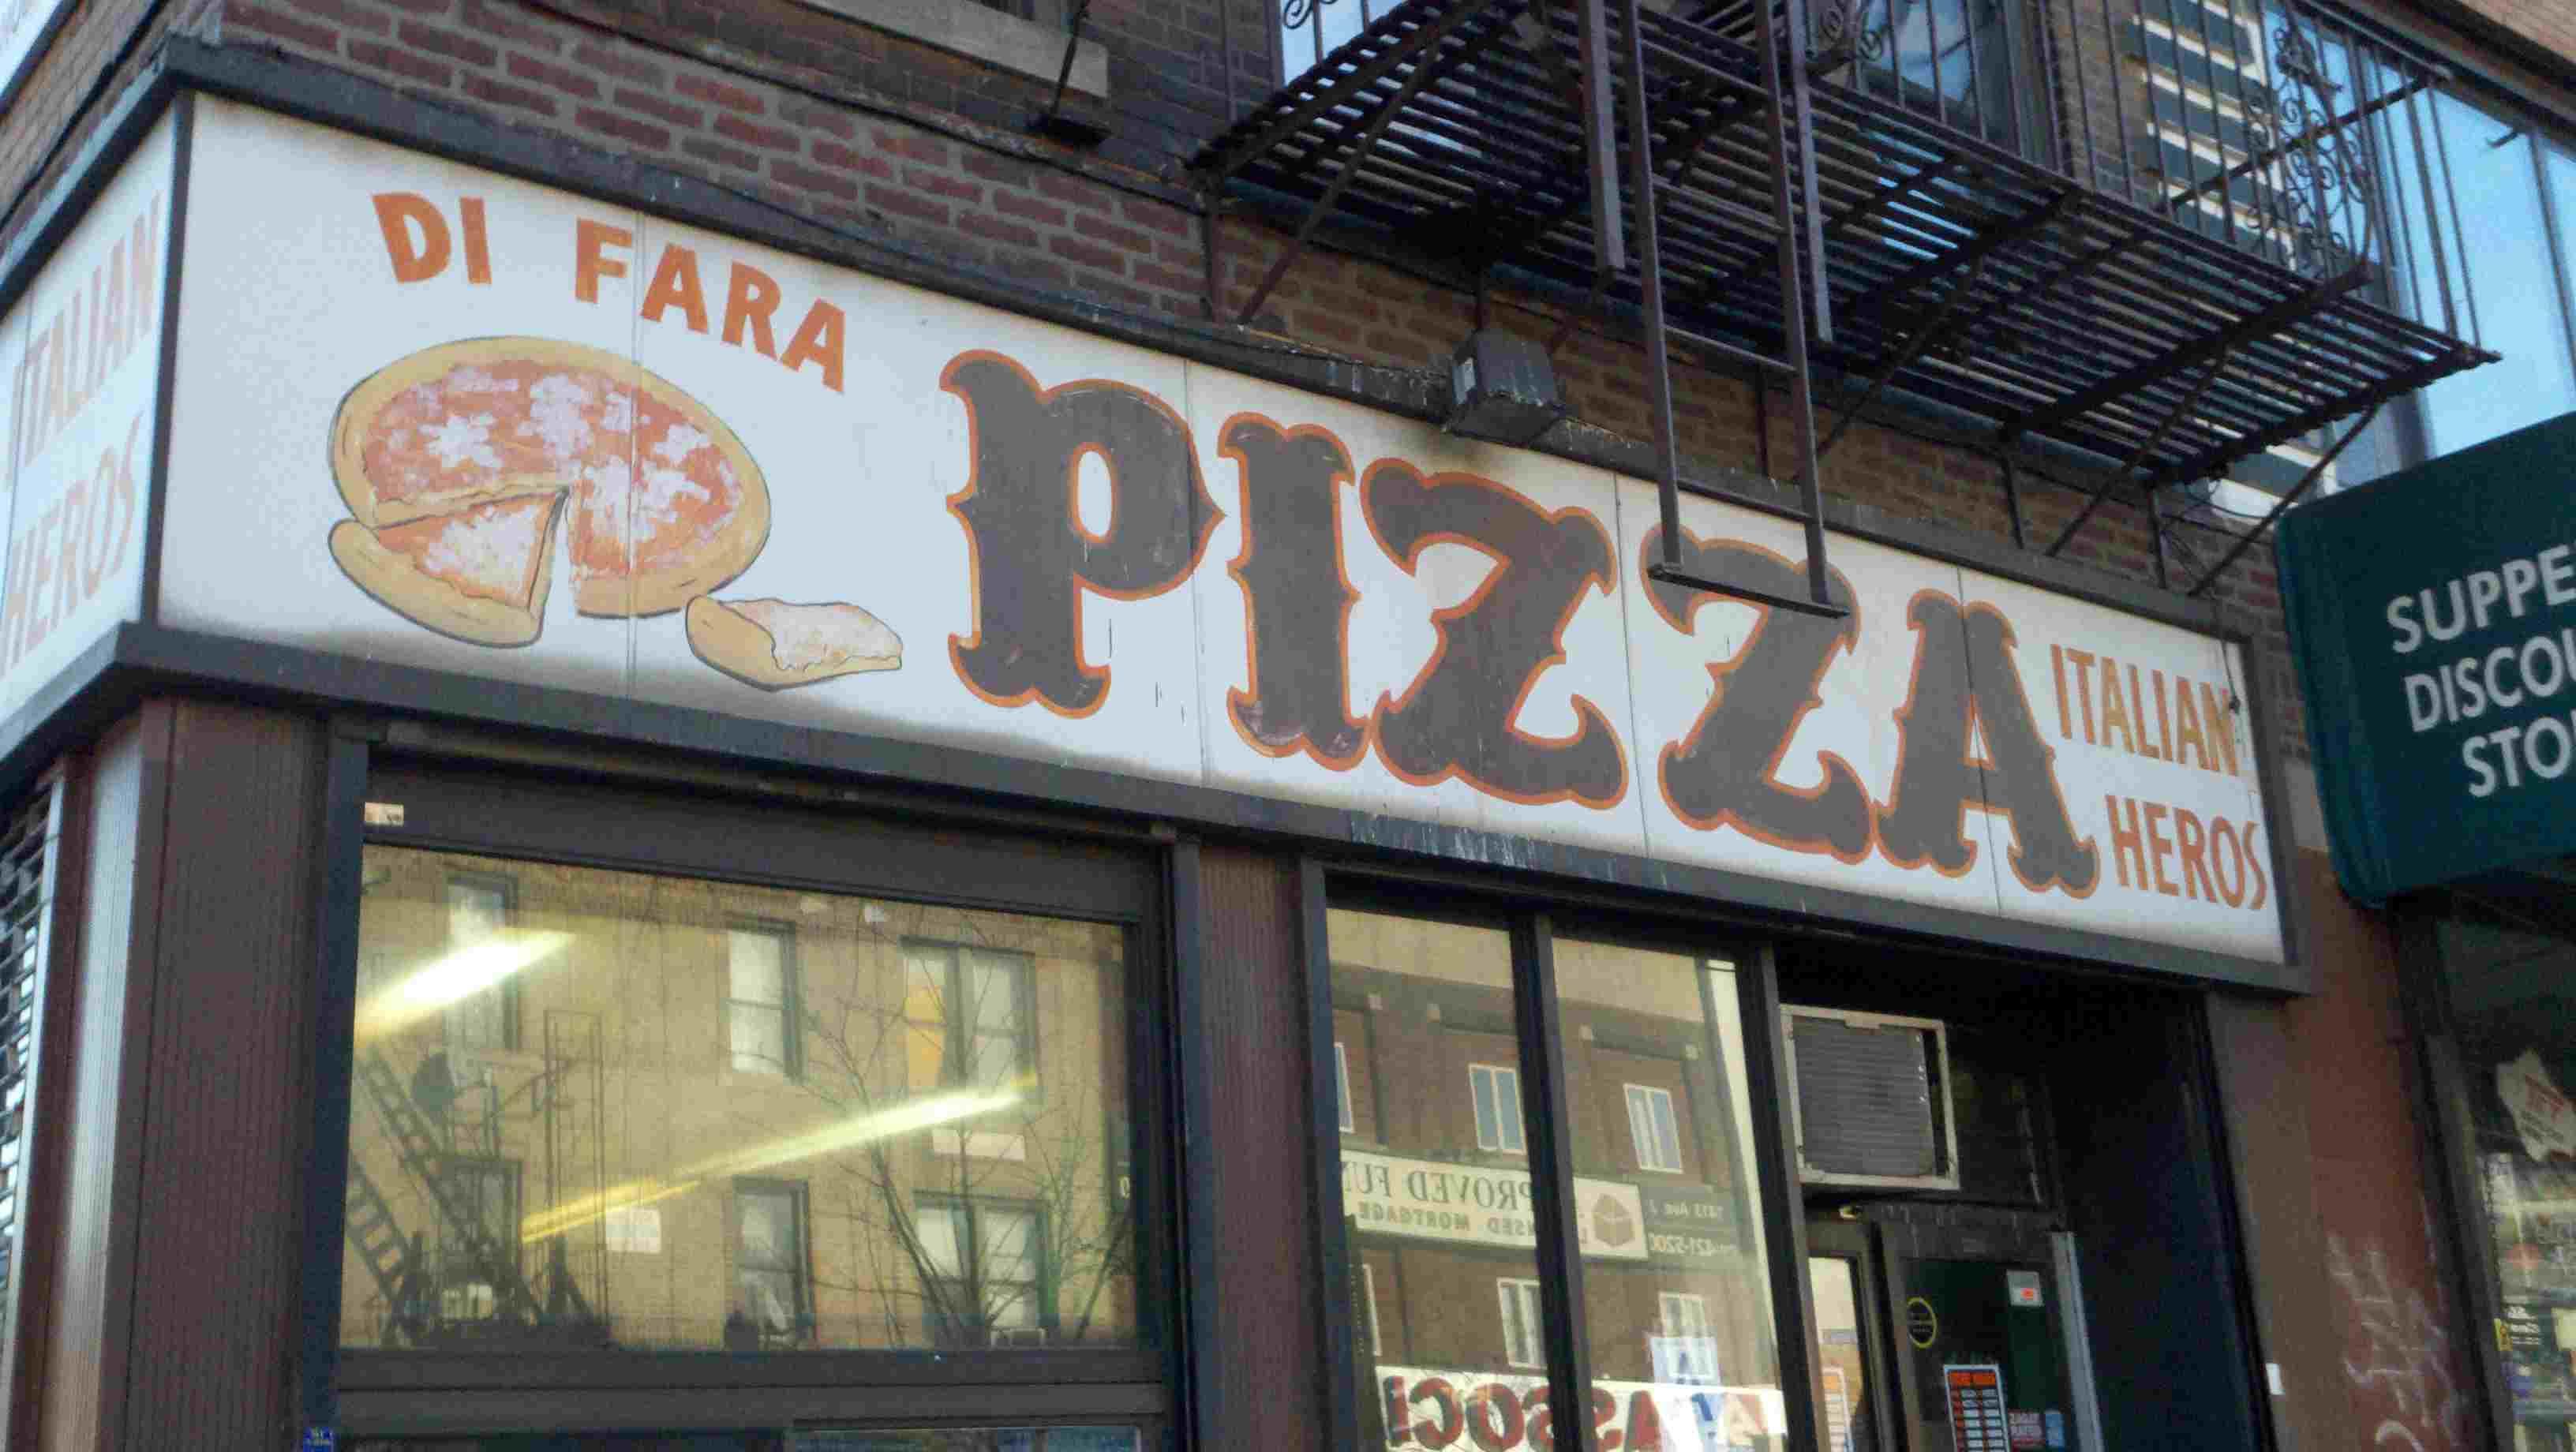 di fara pizza place in brooklyn